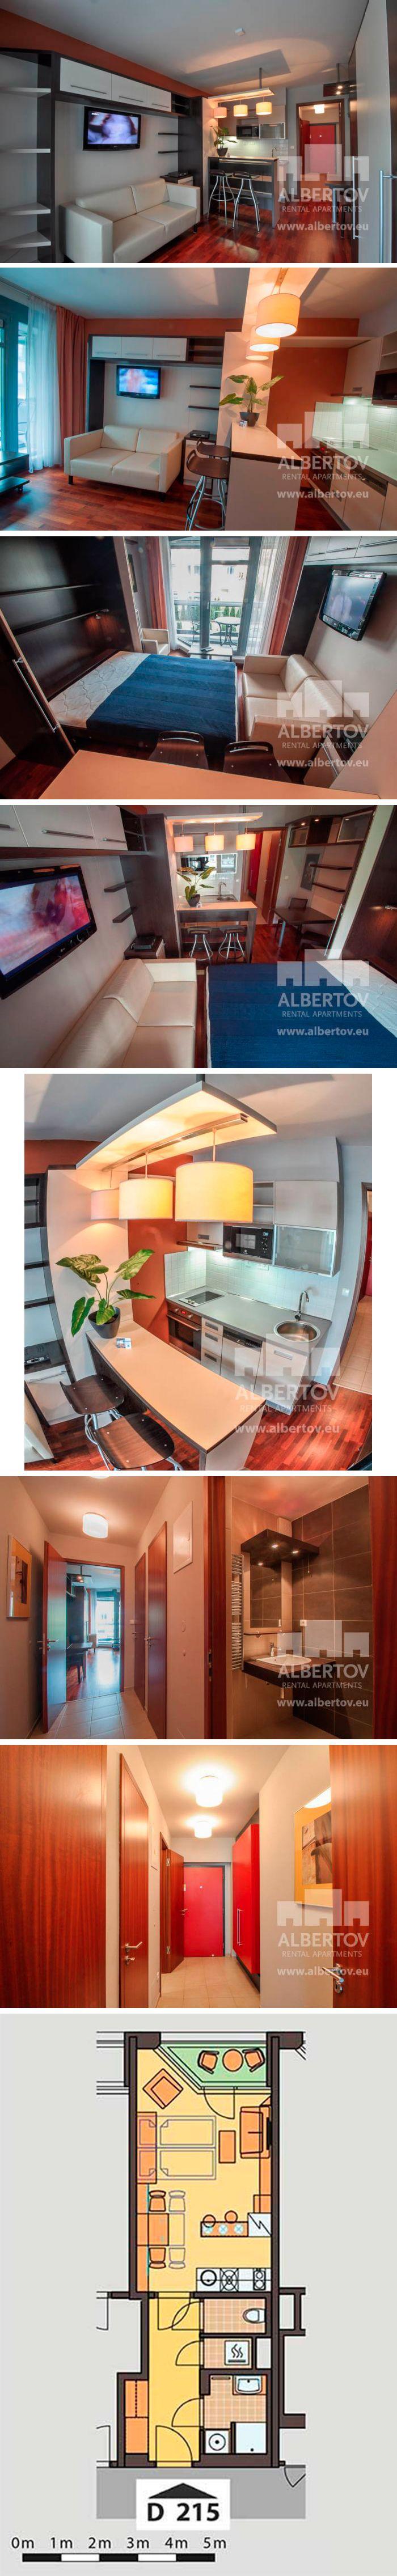 D.215 apartment for rent in Prague: dispozition: 1+kk, floor: 2, balcony, total: 32.7 m2. Albertov Rental Apartments, Horská 2107/2d, Praha 2. Reception: +420 602 22 66 33, reception@albertov.eu, www.albertov.eu